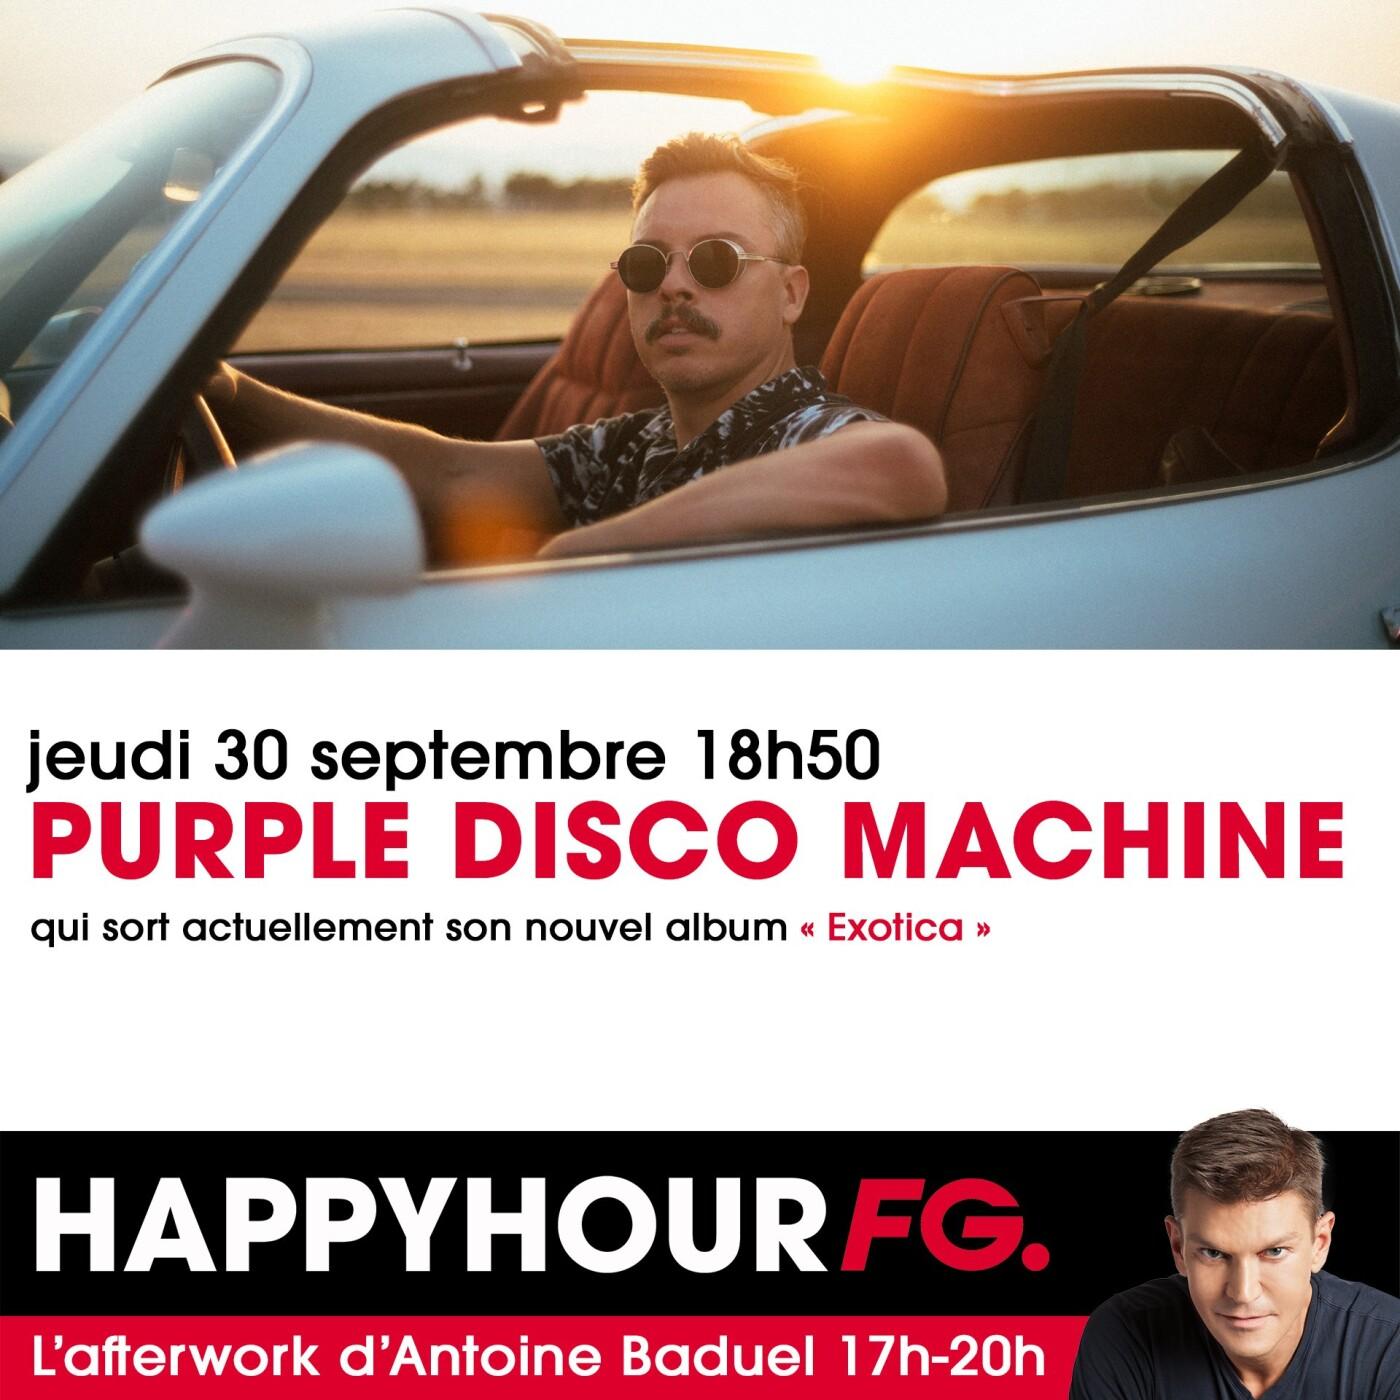 HAPPY HOUR INTERVIEW : PURPLE DISCO MACHINE